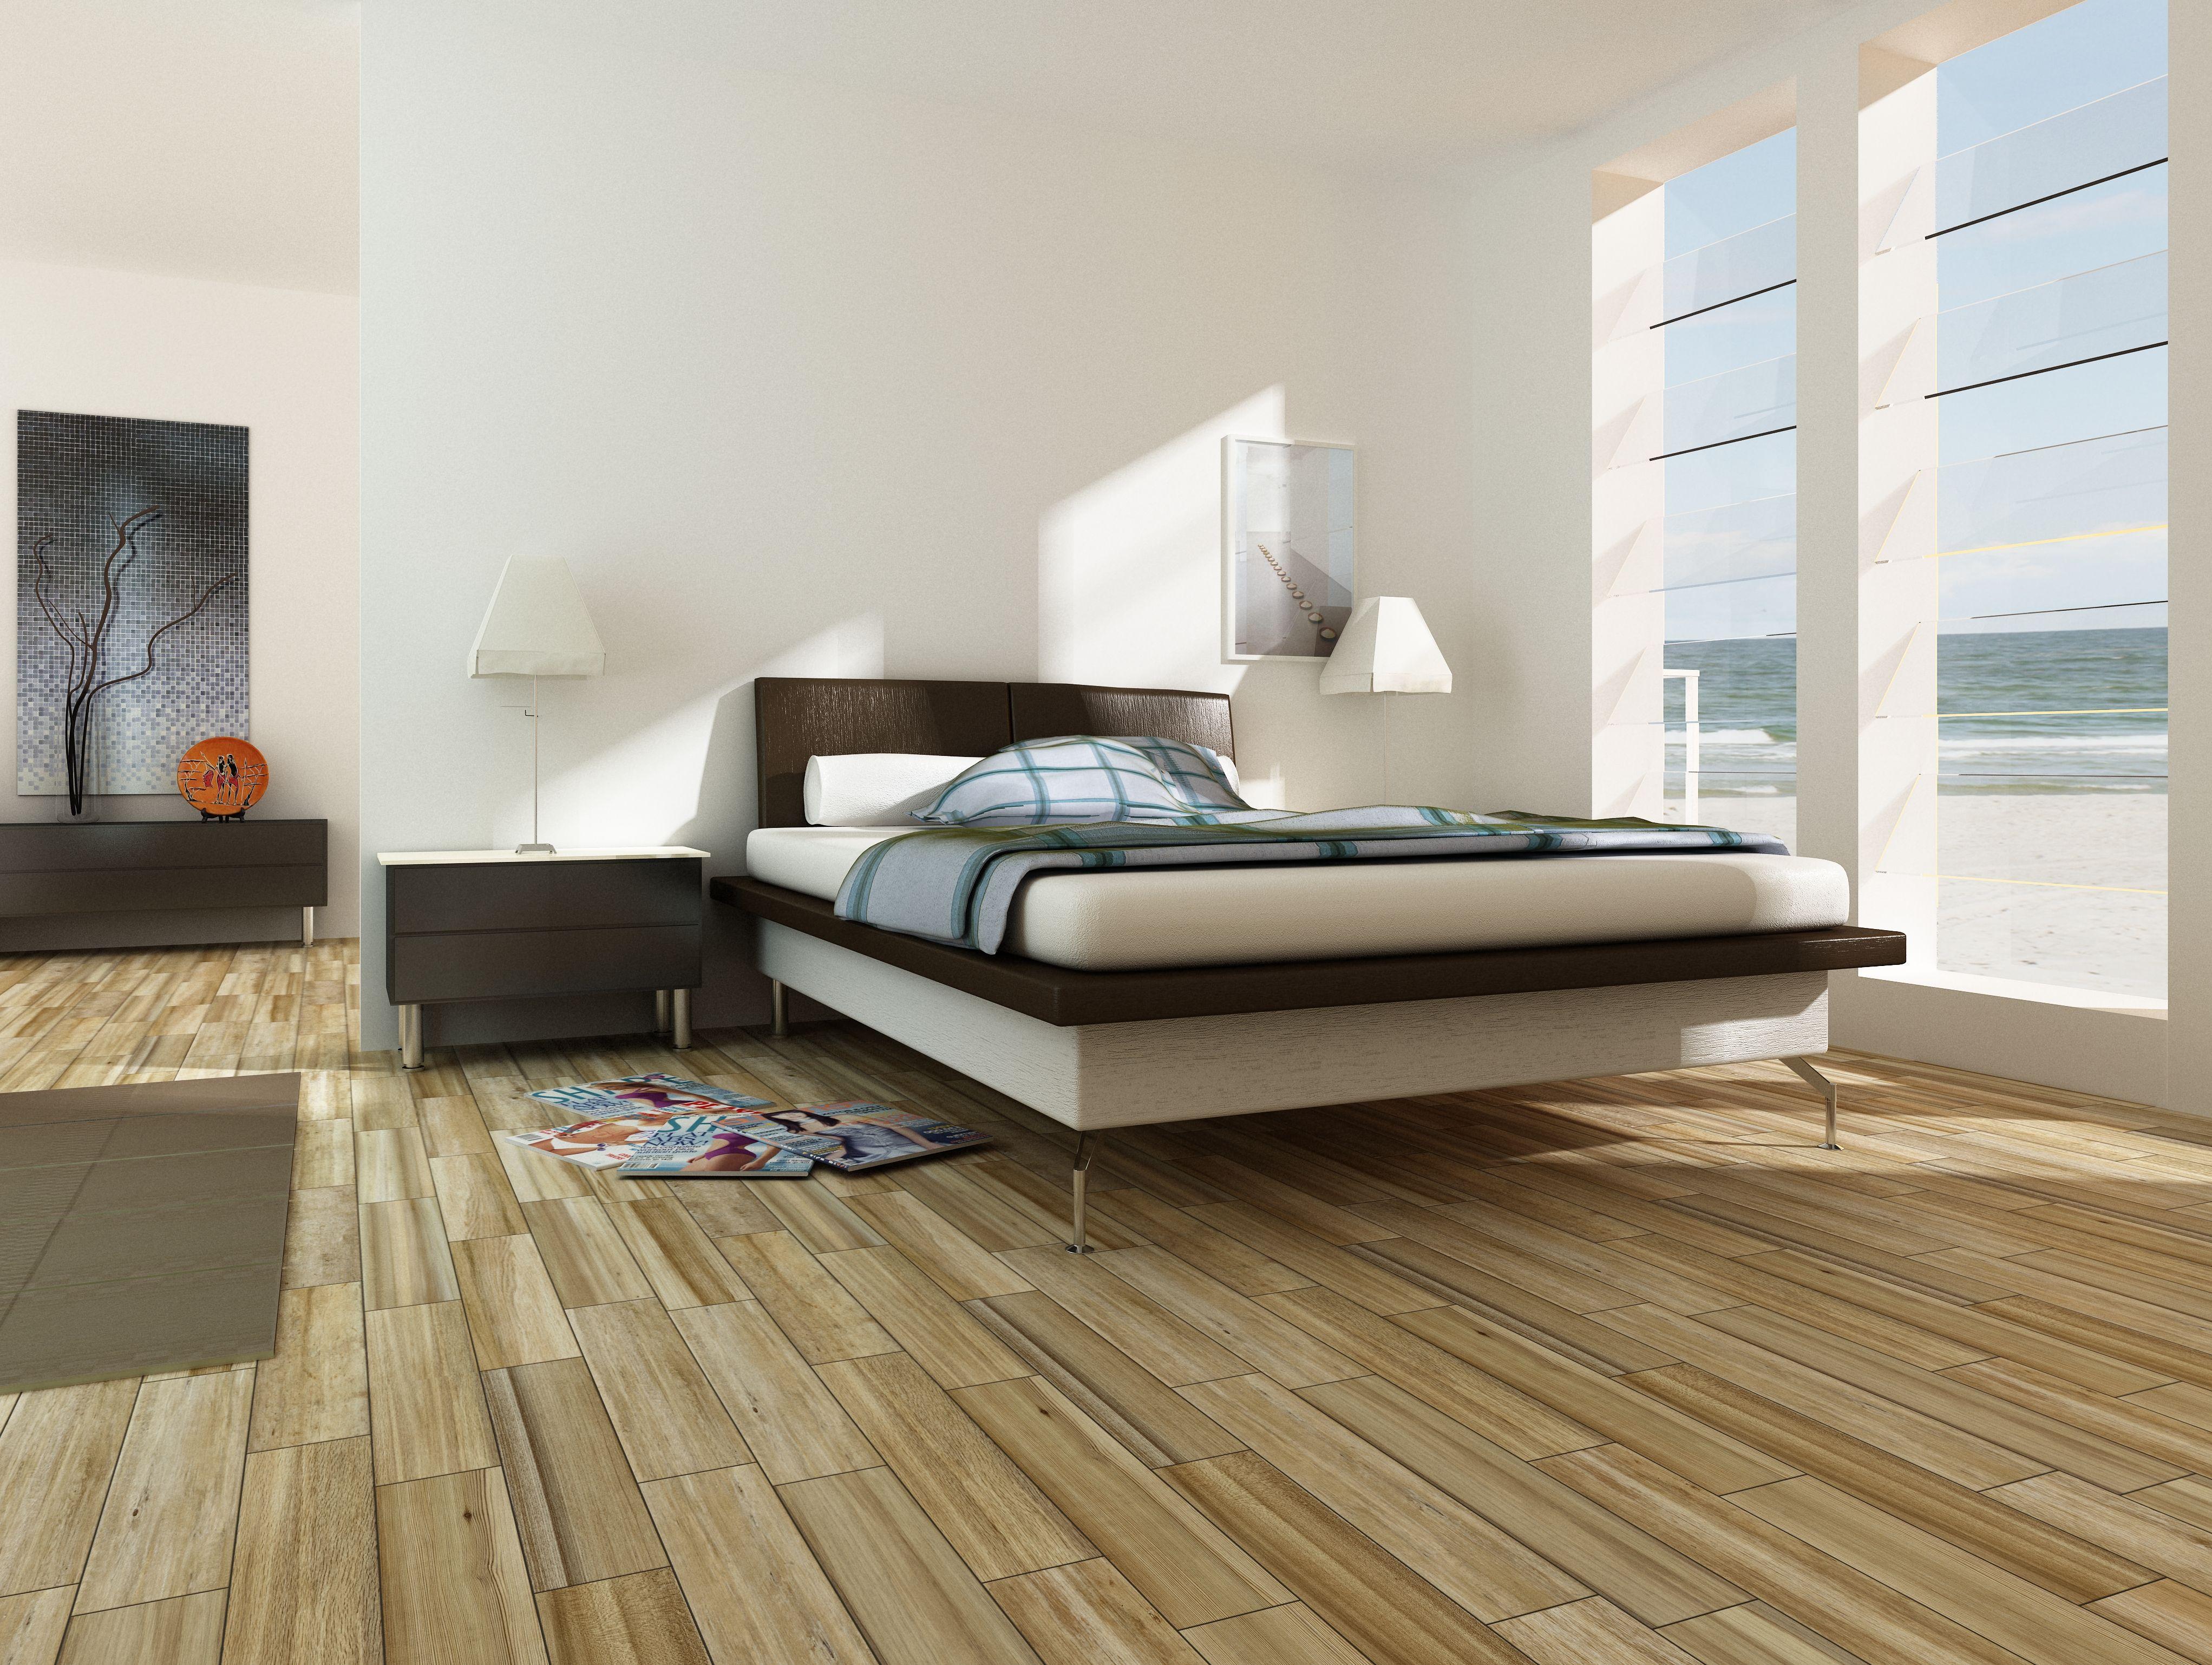 interceramic - Trio Legno - Glazed Porcelain Floor Tile ...